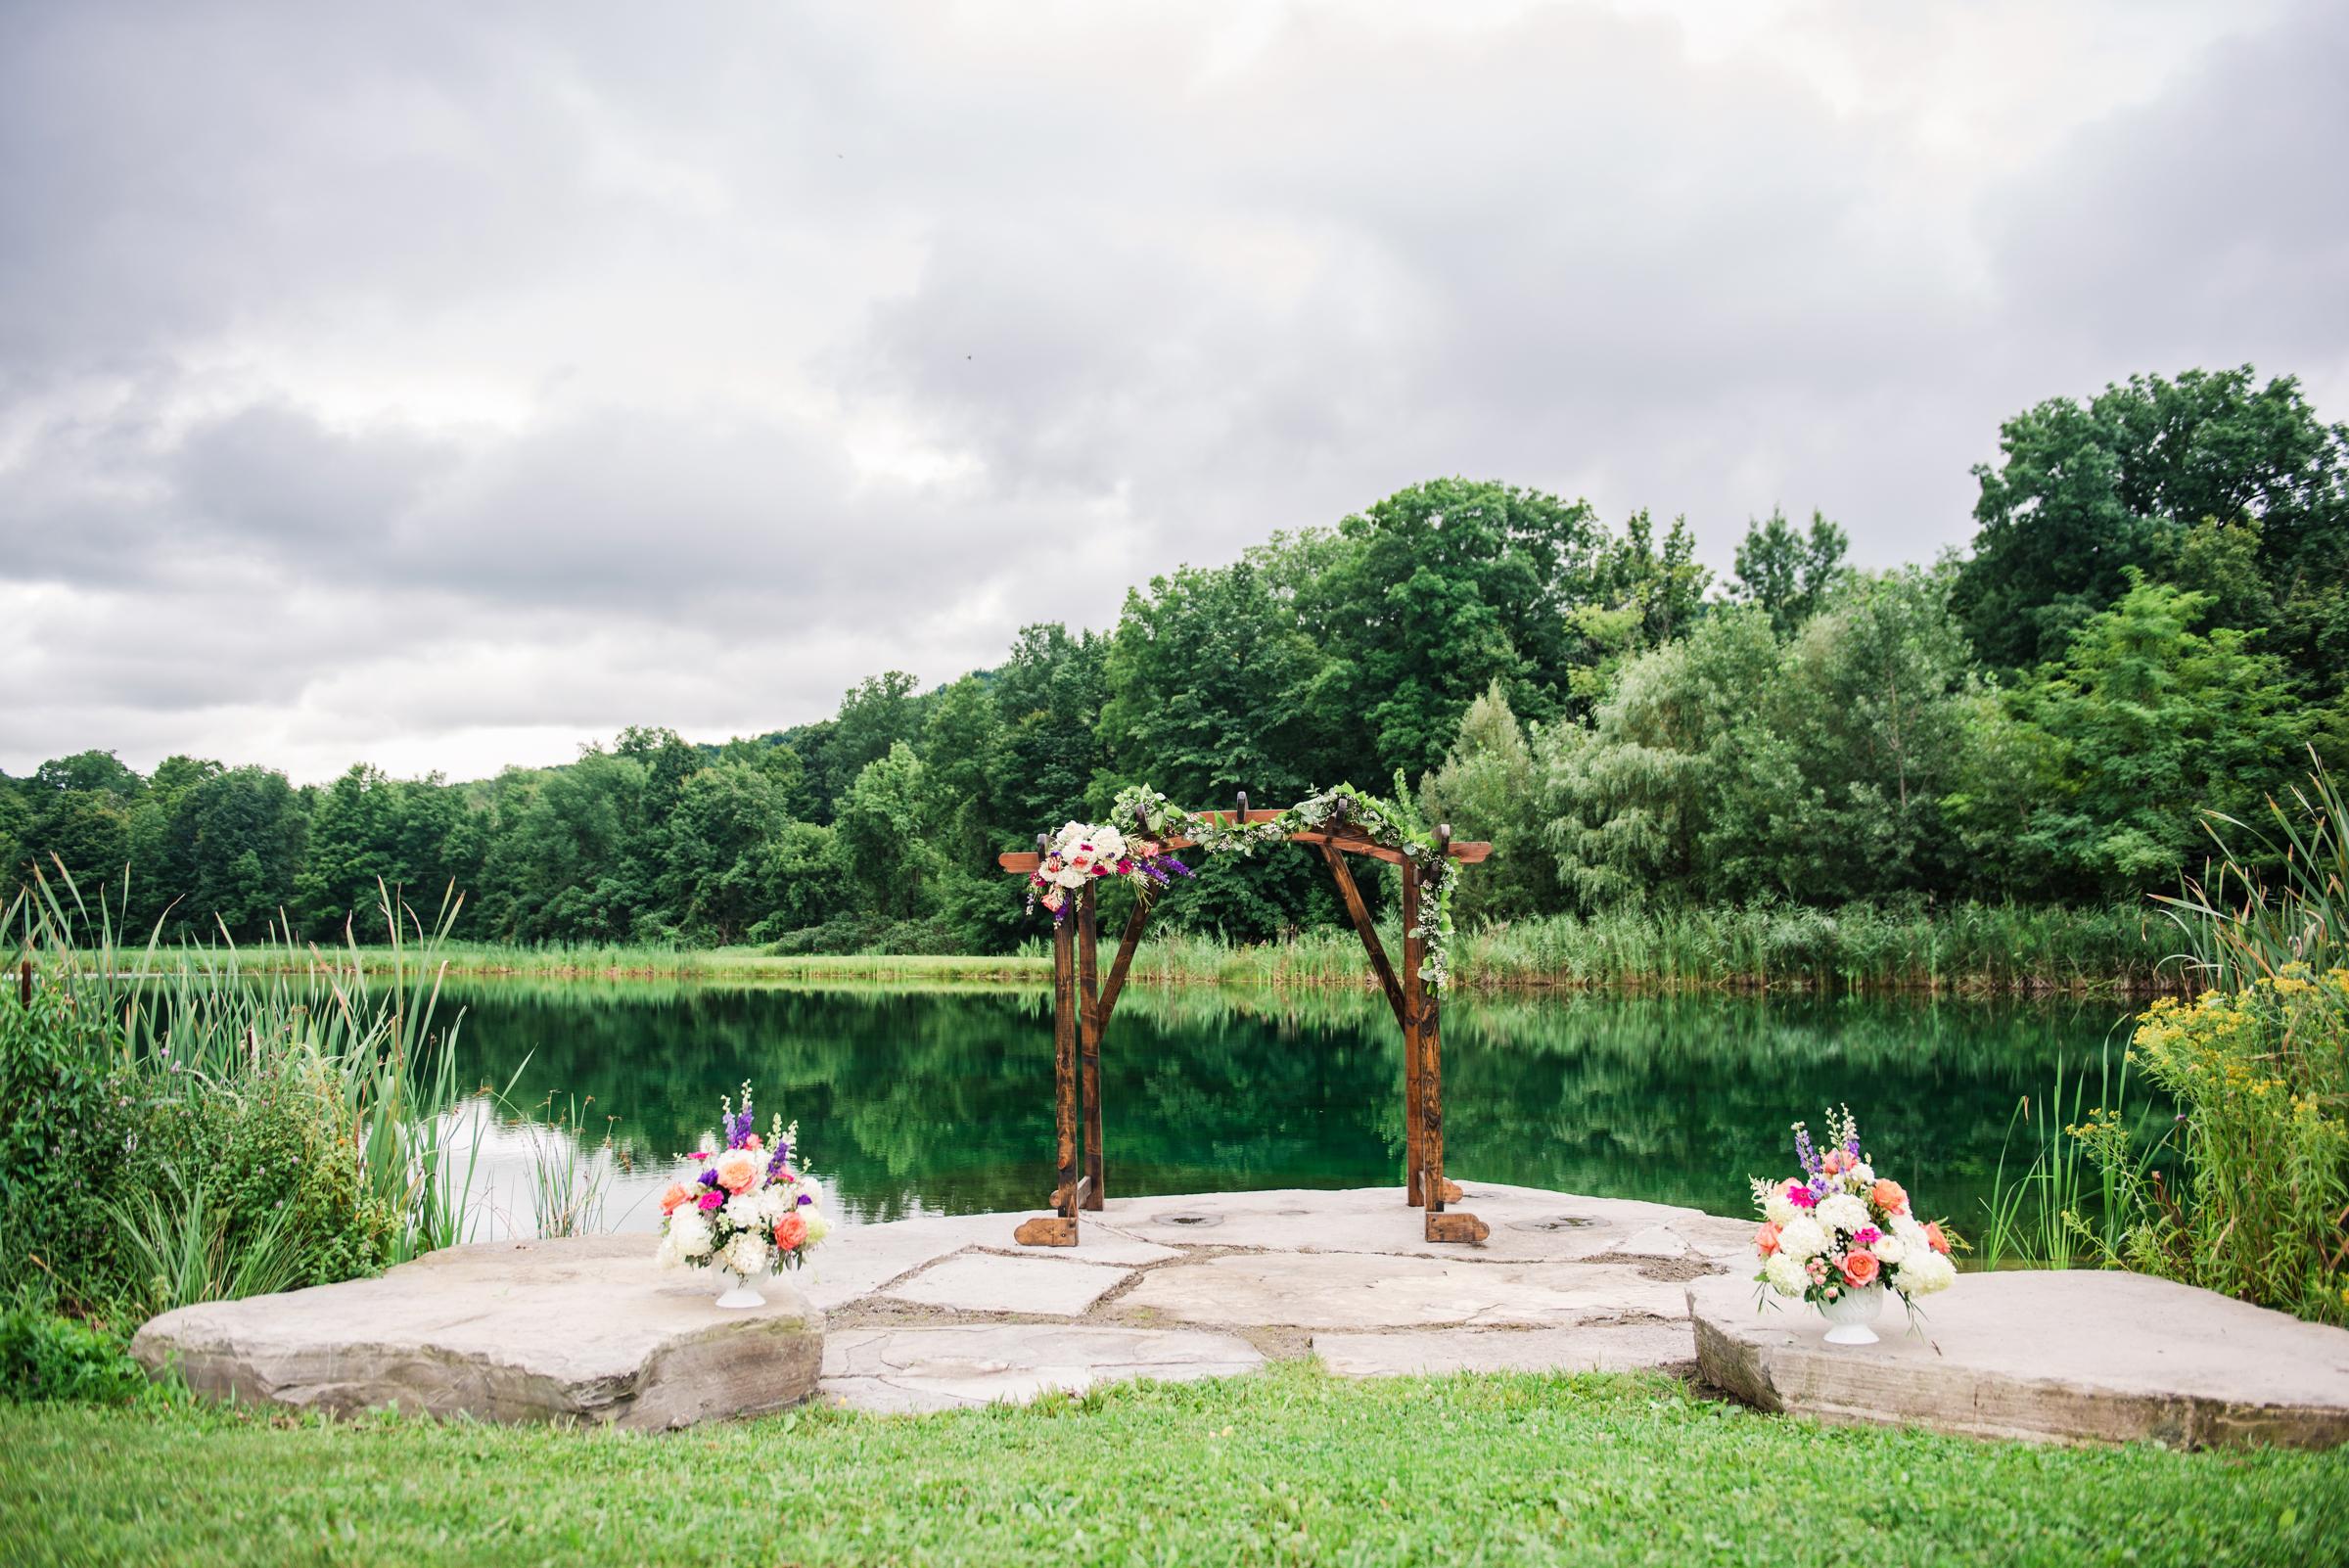 Wolf_Oak_Acres_Central_NY_Wedding_JILL_STUDIO_Rochester_NY_Photographer_DSC_8276.jpg